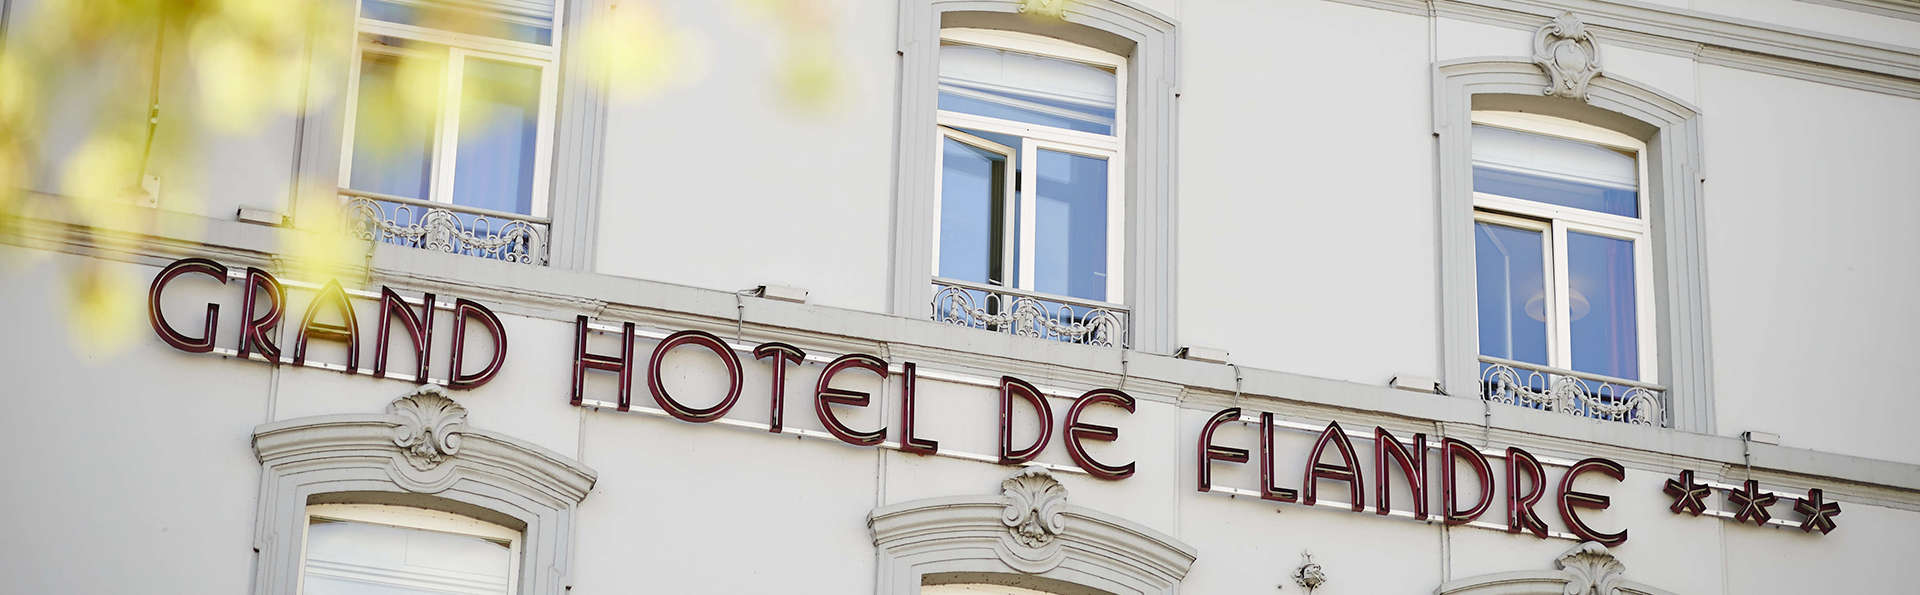 Grand Hotel de Flandre - EDIT_Exterior.jpg